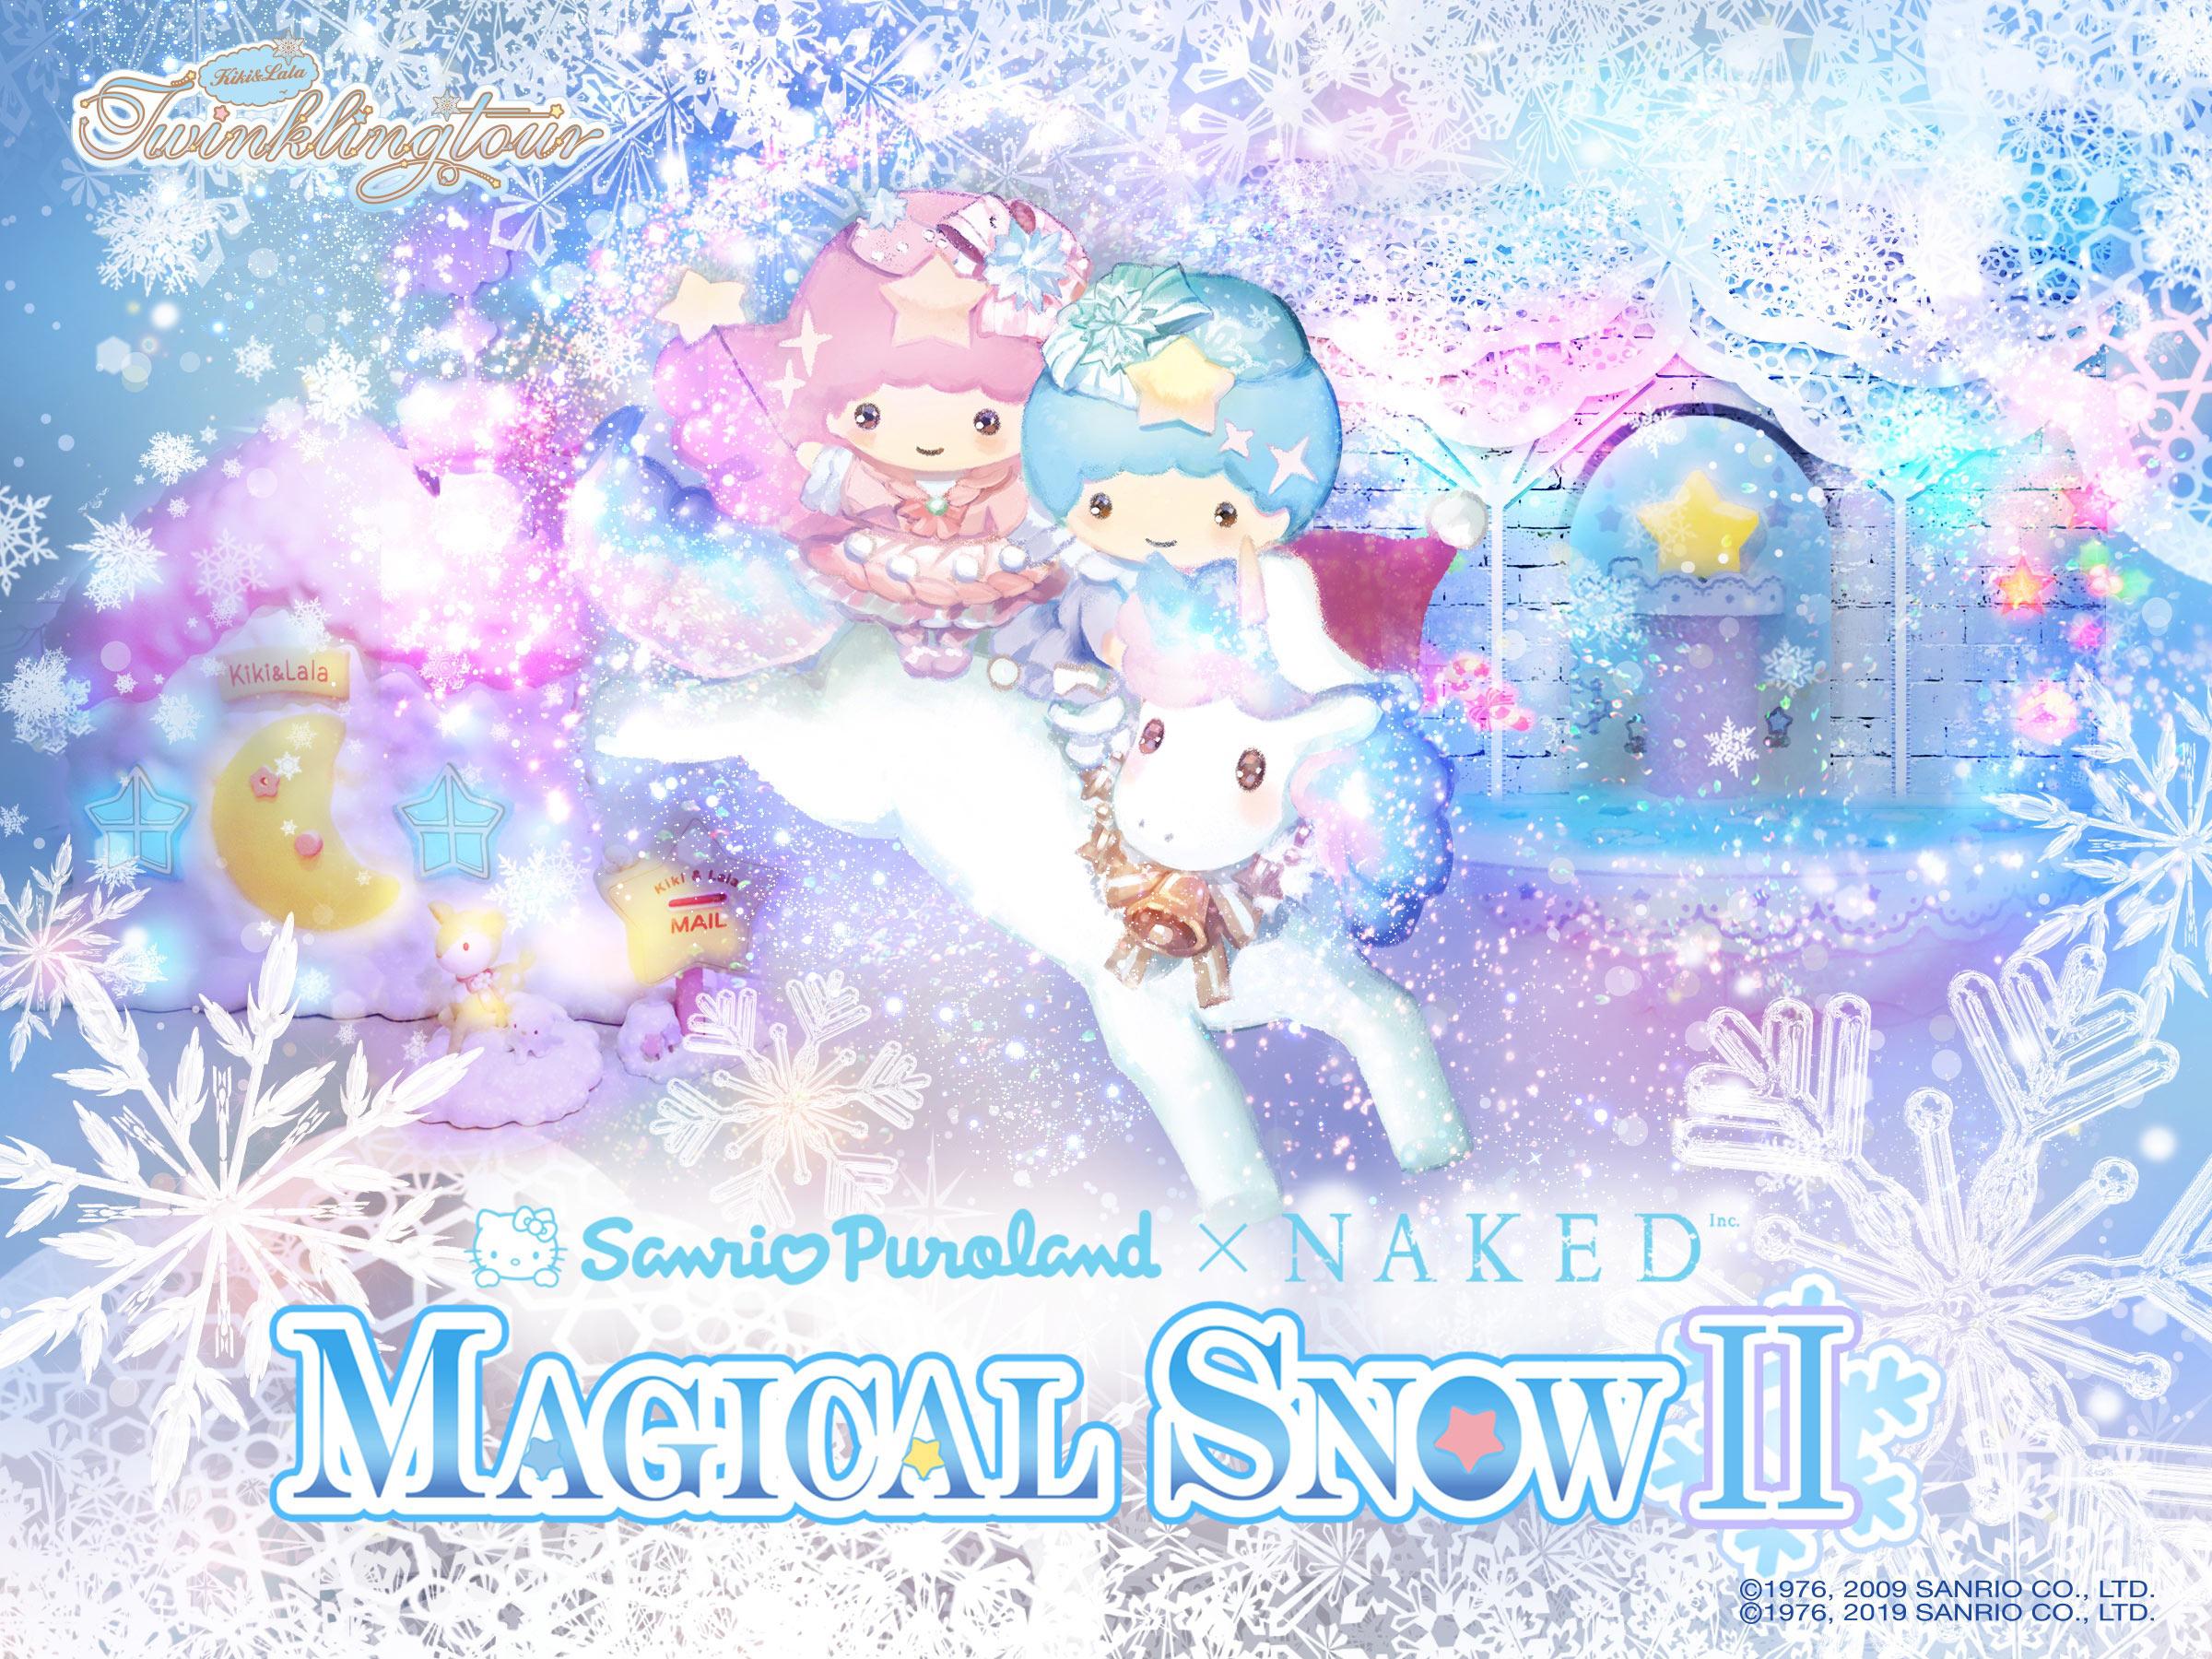 Sanrio Puroland × NAKED「MAGICAL SNOW Ⅱ」